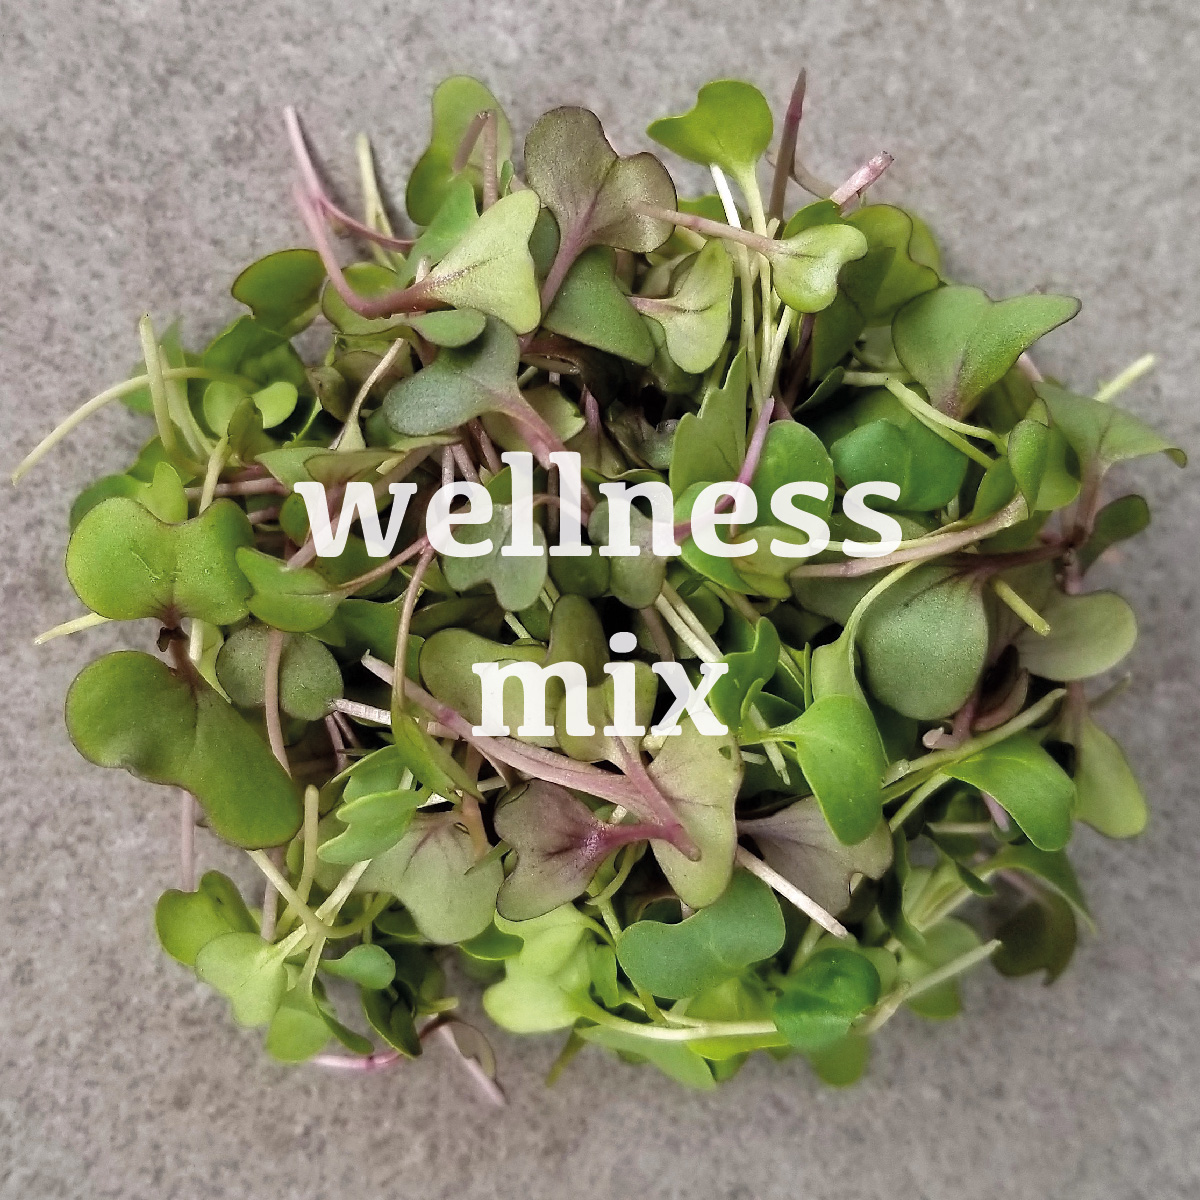 wellness mix web.jpg